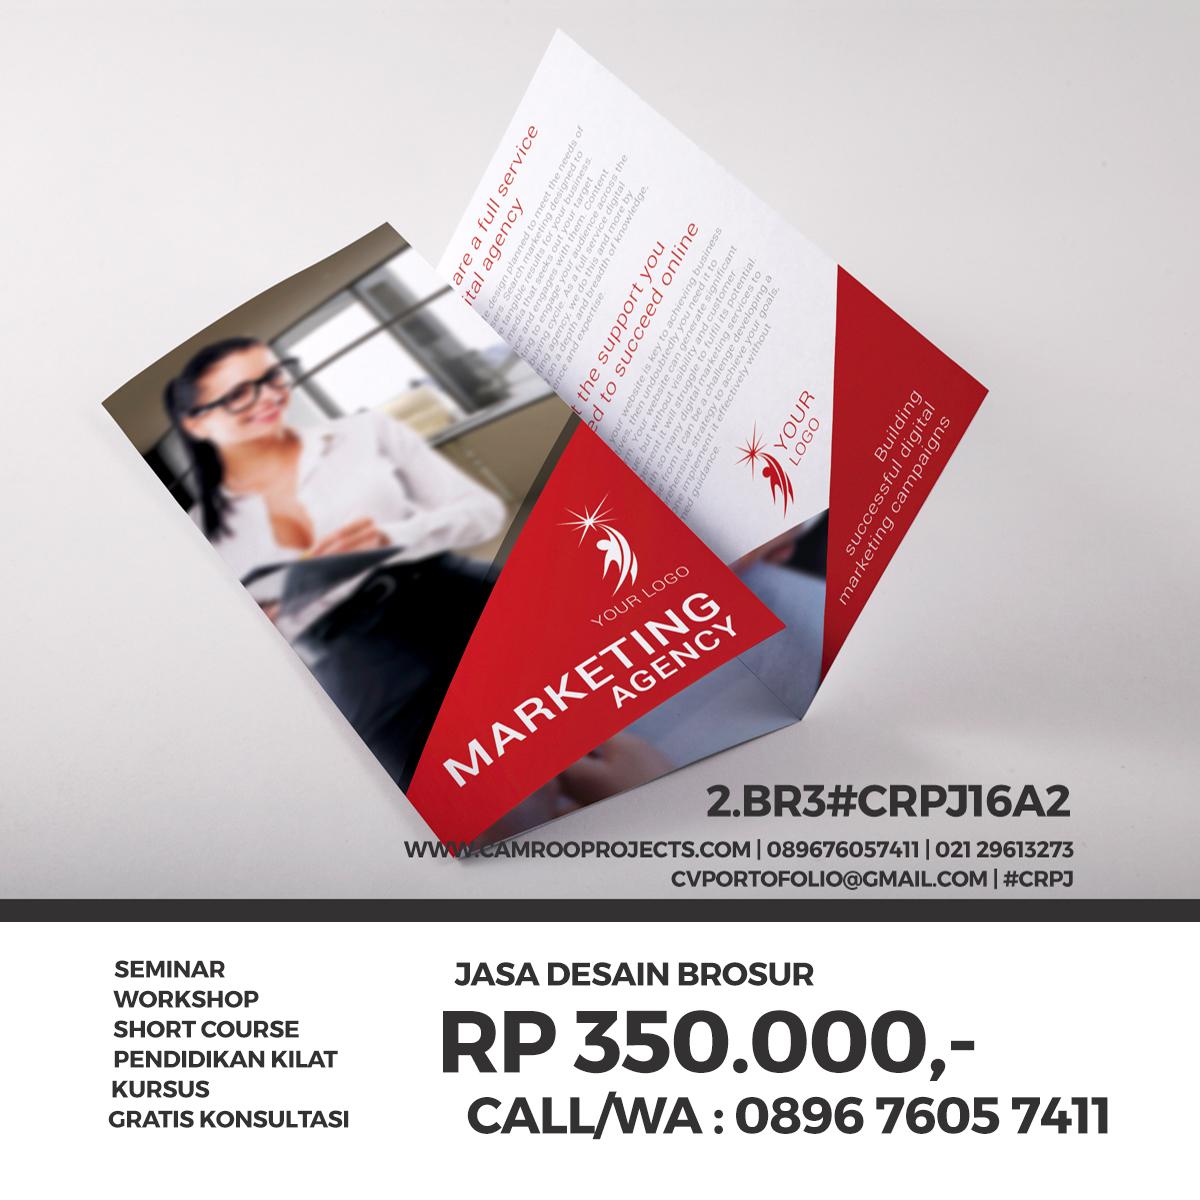 Jasa Desain Brosur/Flyer Di Bogor